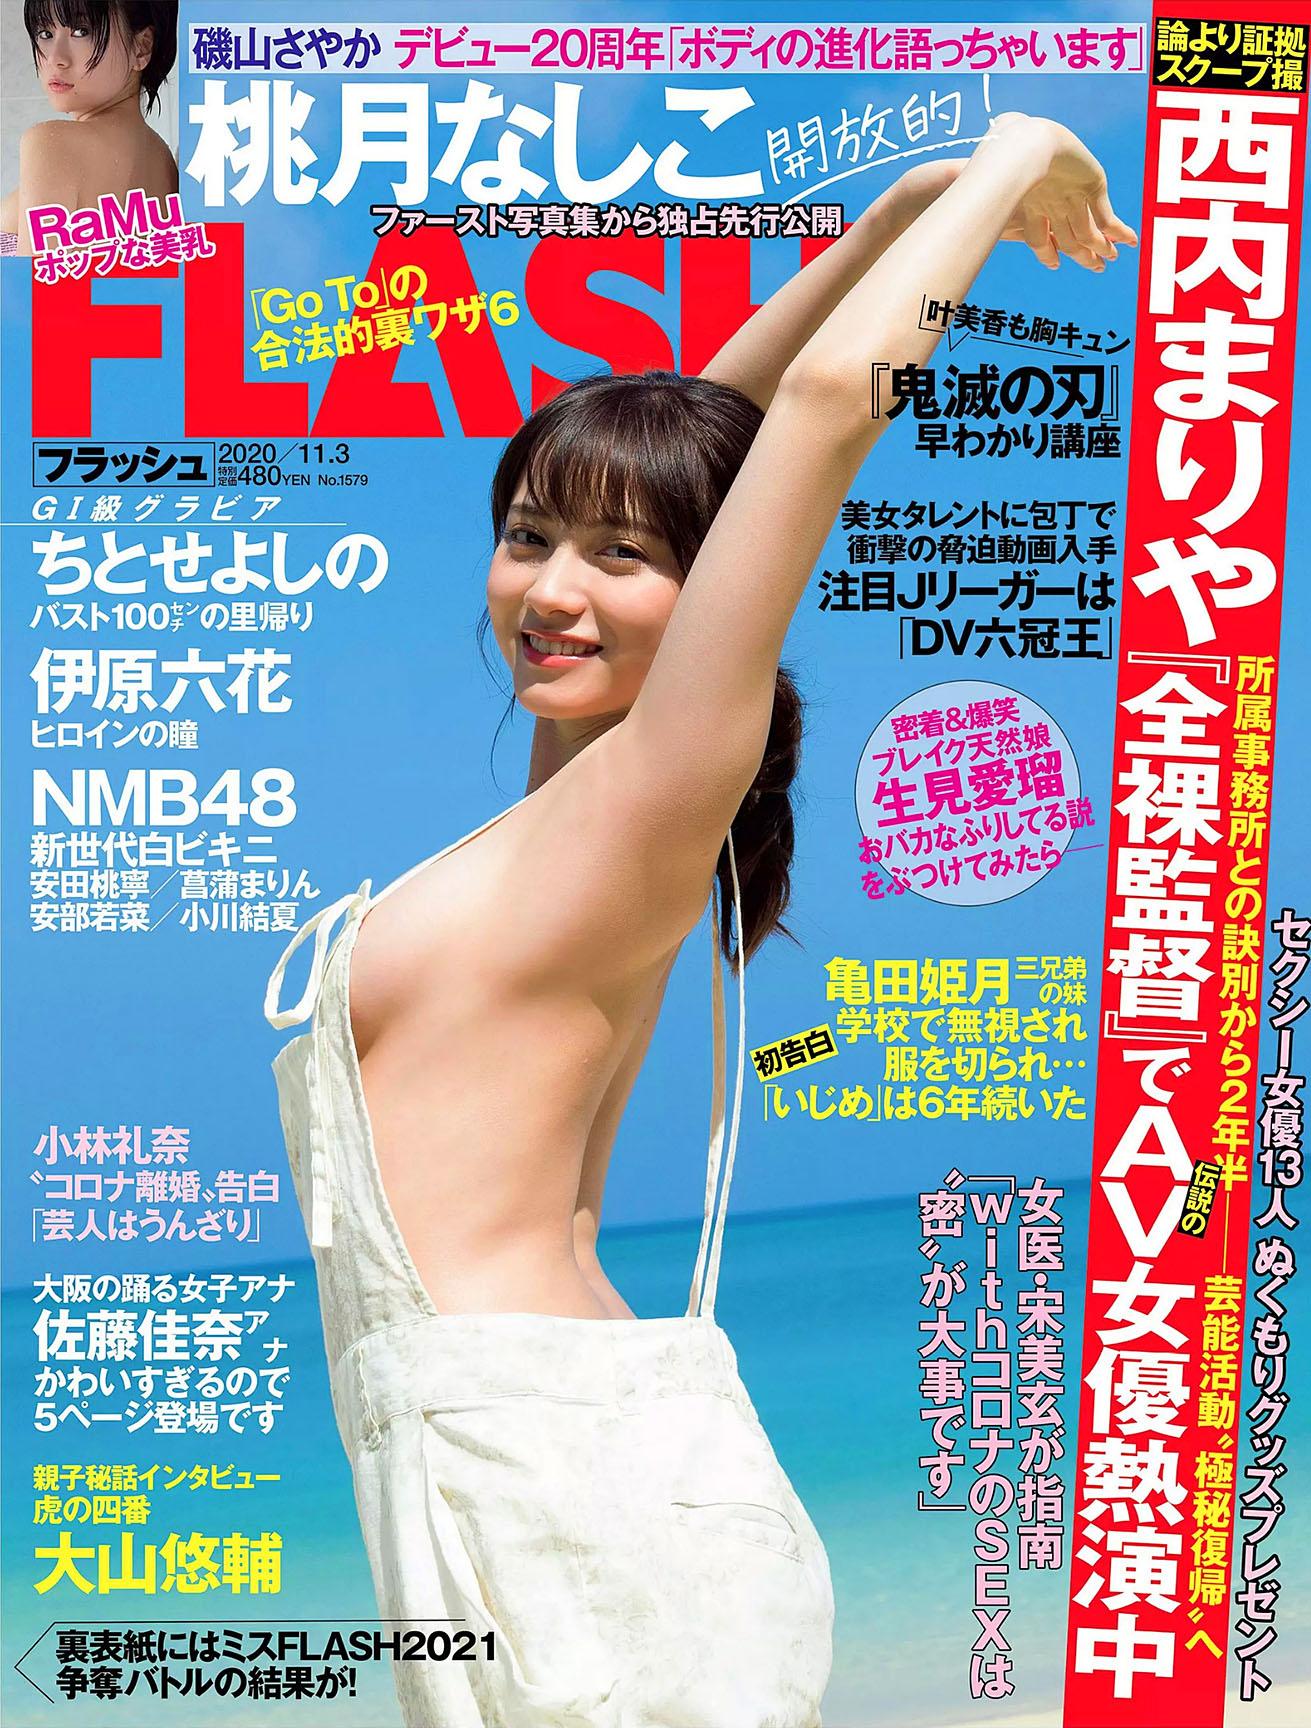 NMomotsuki Flash 201103 01.jpg